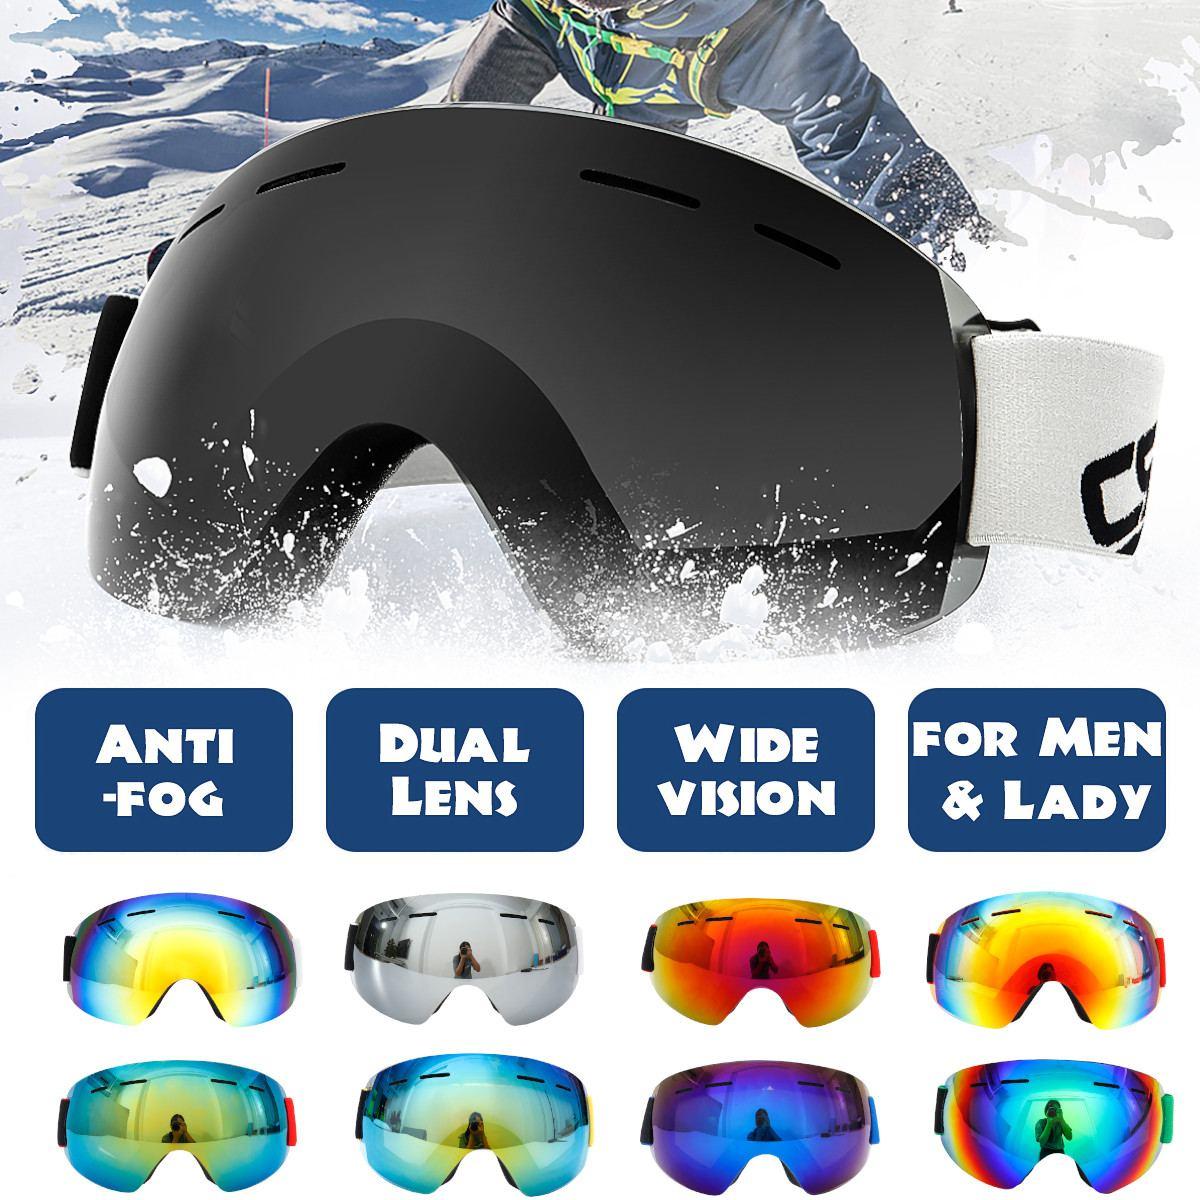 Ski Snowboard Goggles Unisex Anti Fog UV Double Lens Skiing Goggle Big Ski Mask Glasses Two Layers Lens Eyewear For Men Women